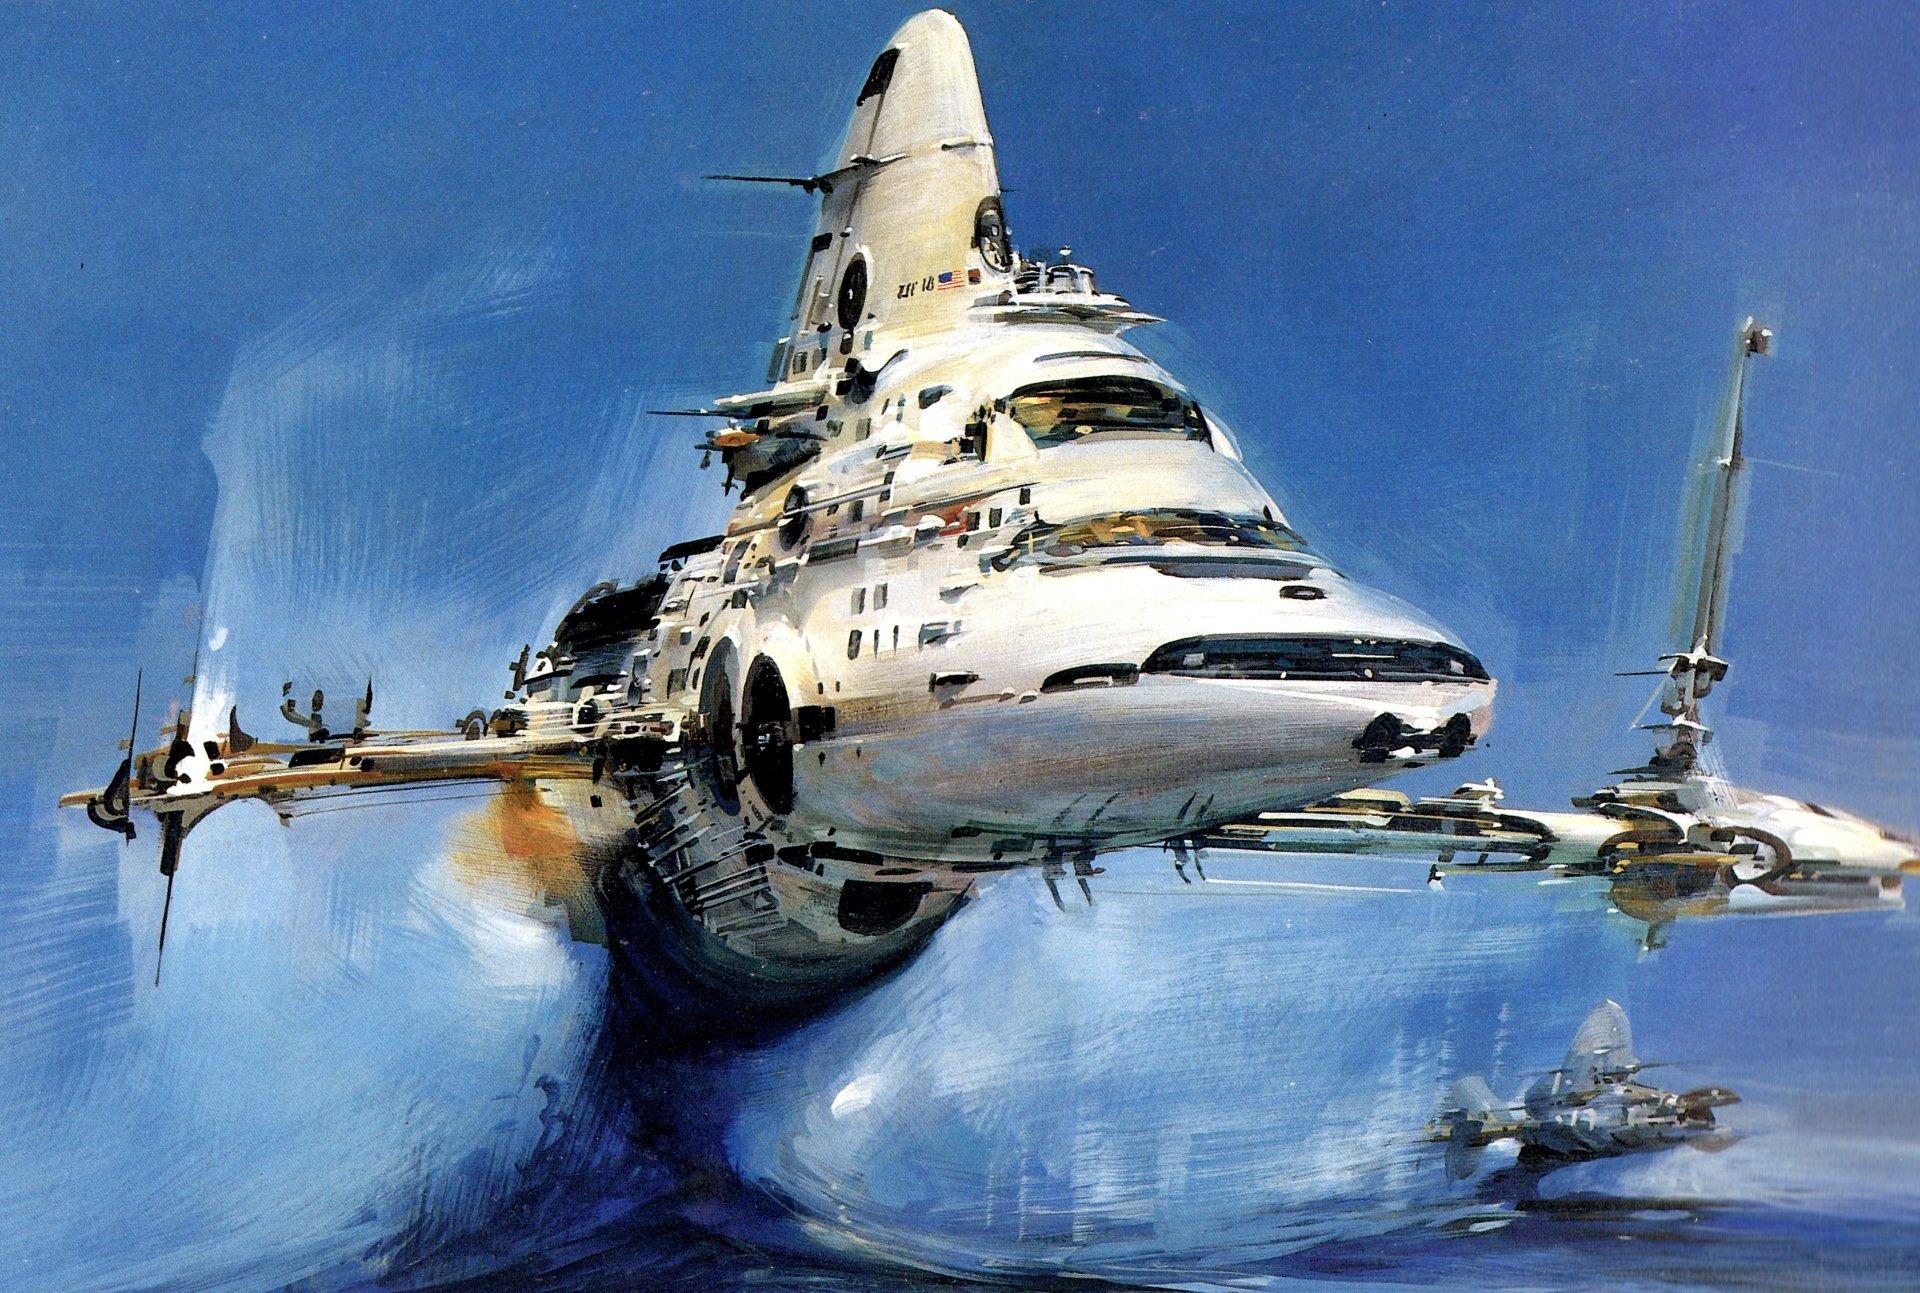 Spaceship 4k Ultra HD Wallpaper